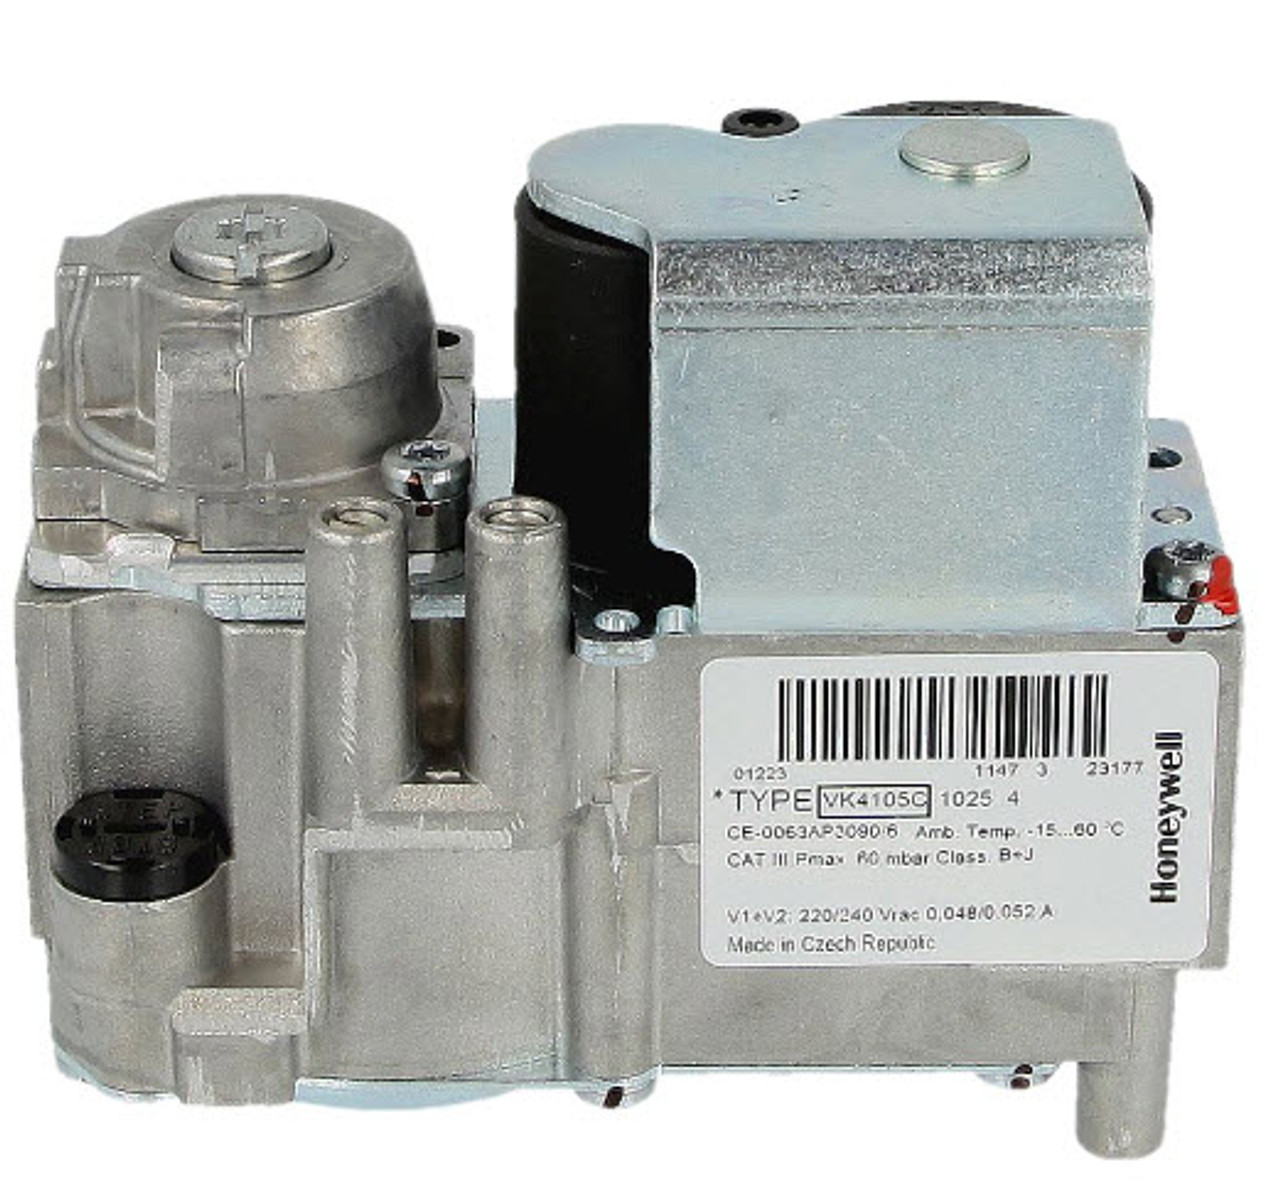 Honeywell VK4105C1025U Gas control block CVI valve